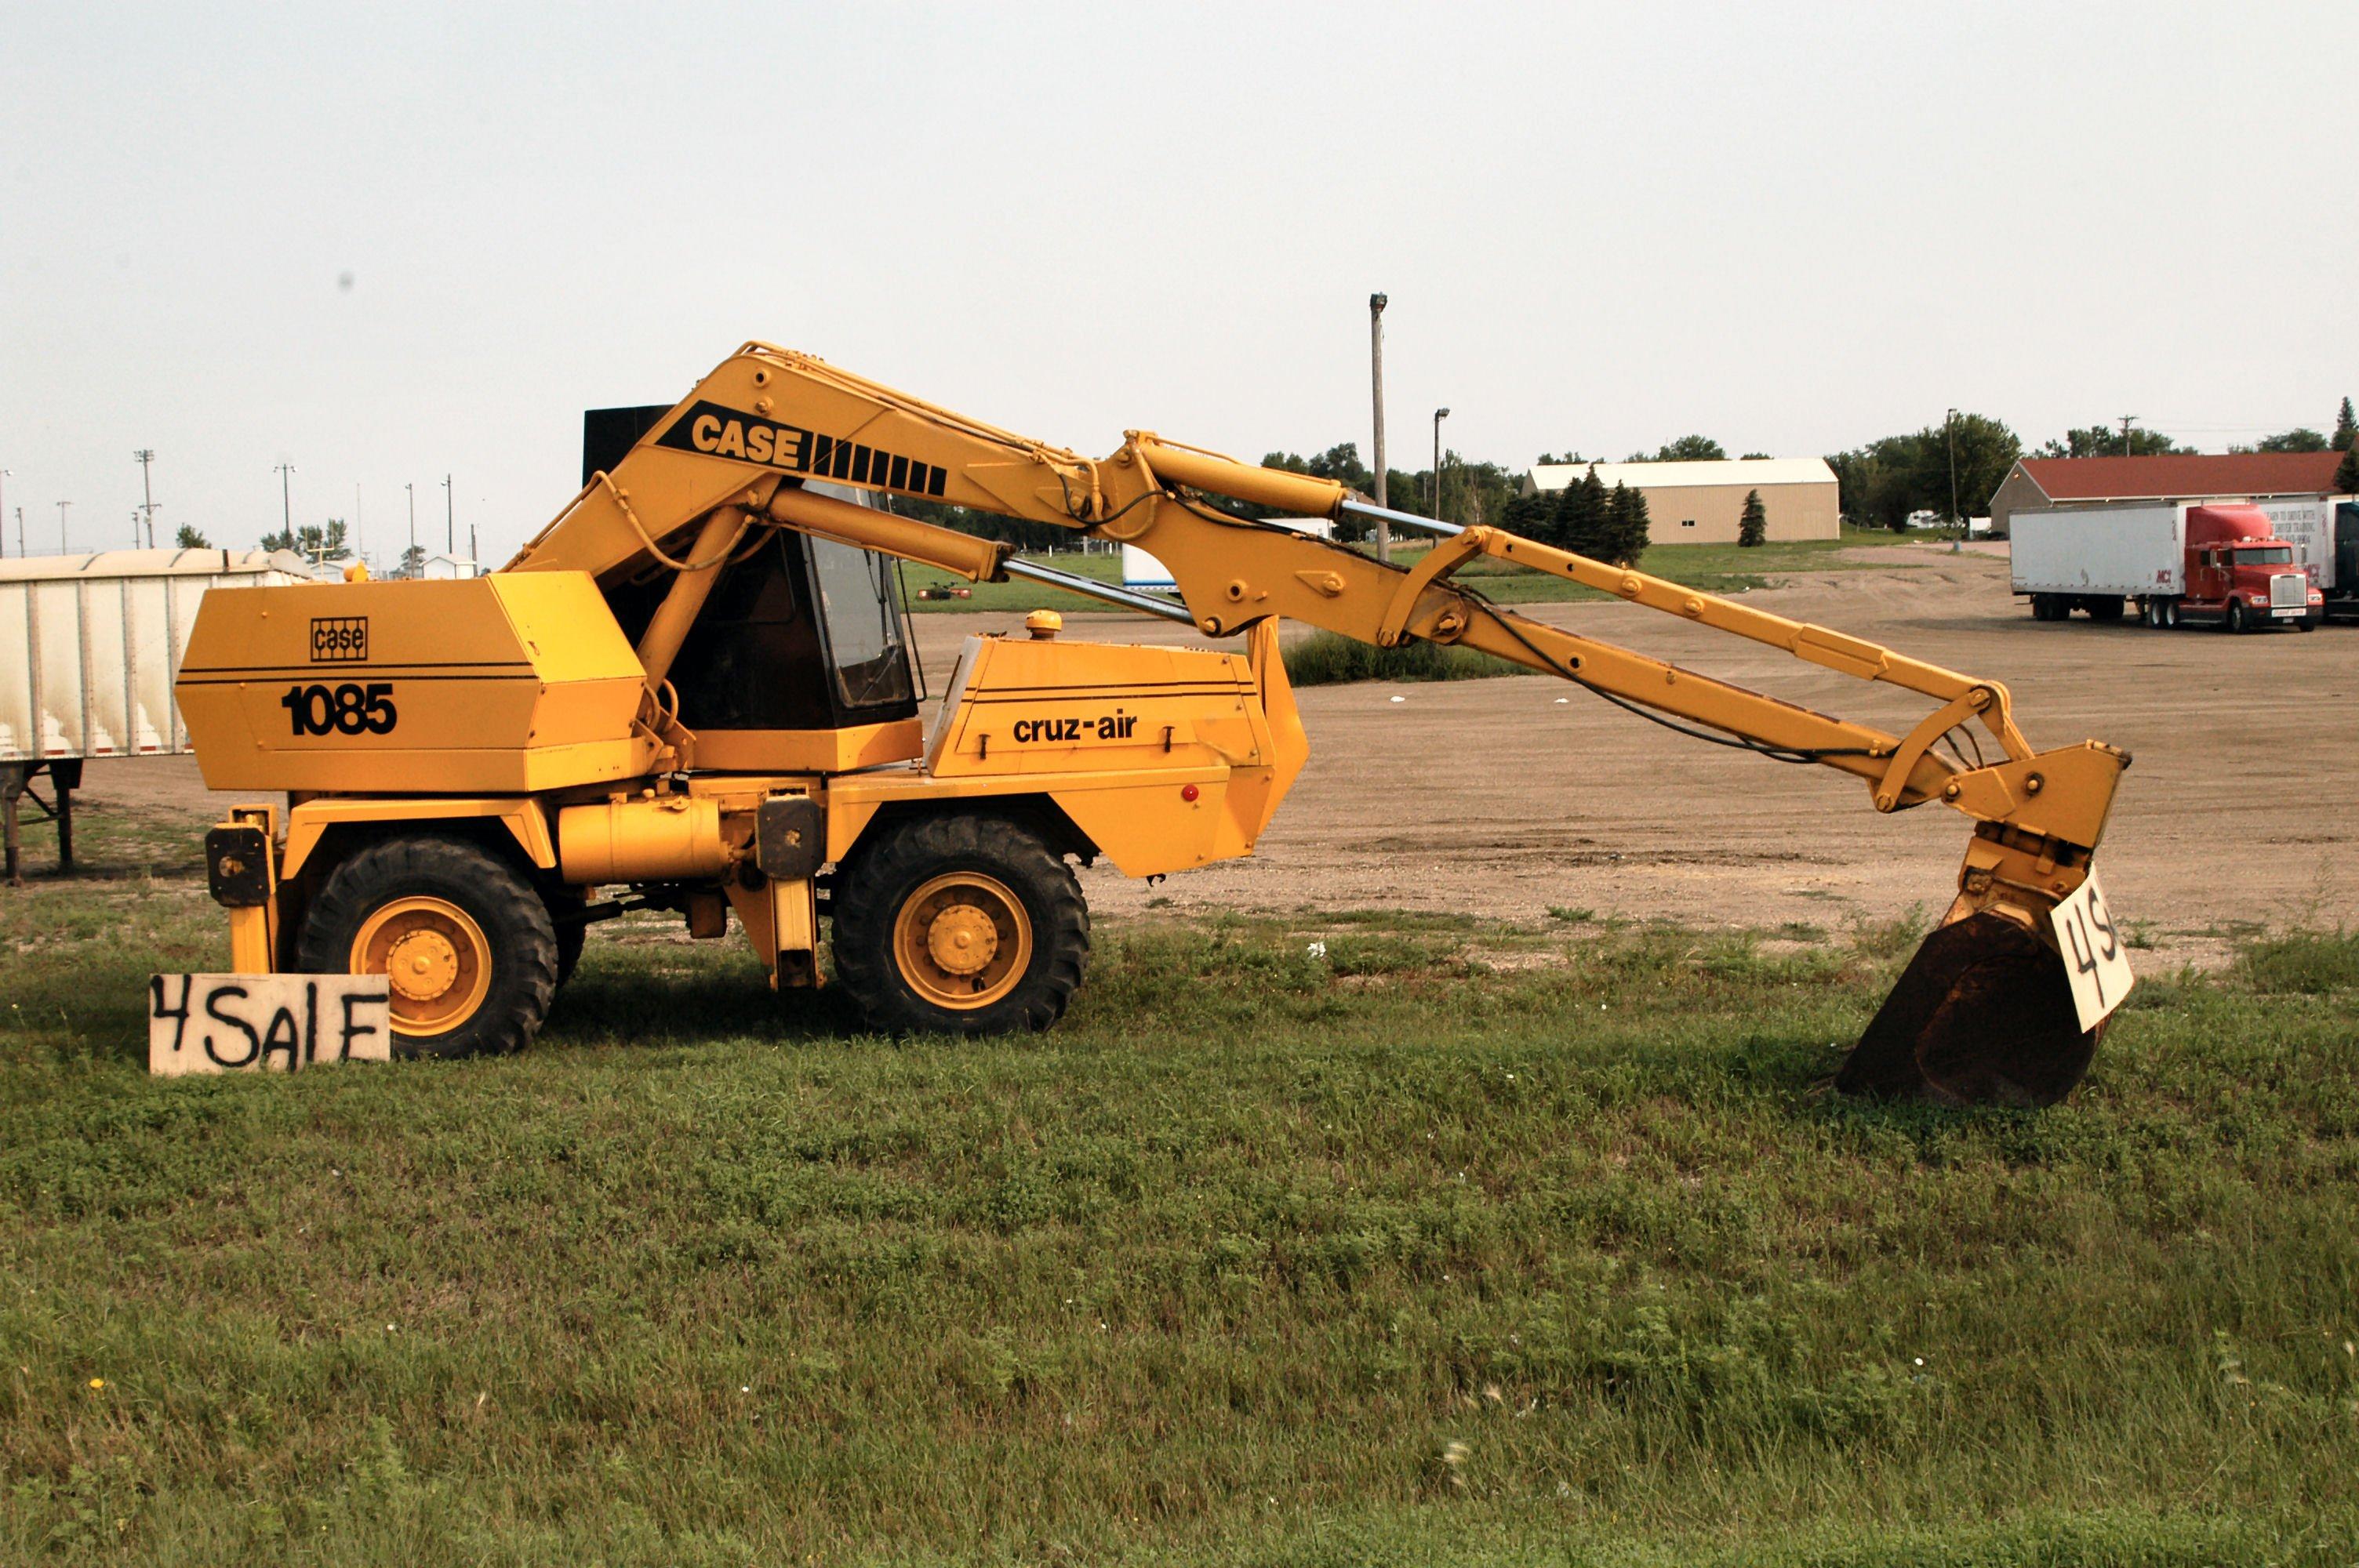 cruz air  escavatore gommato case drott Case_1085_cruz_air_05_of_57